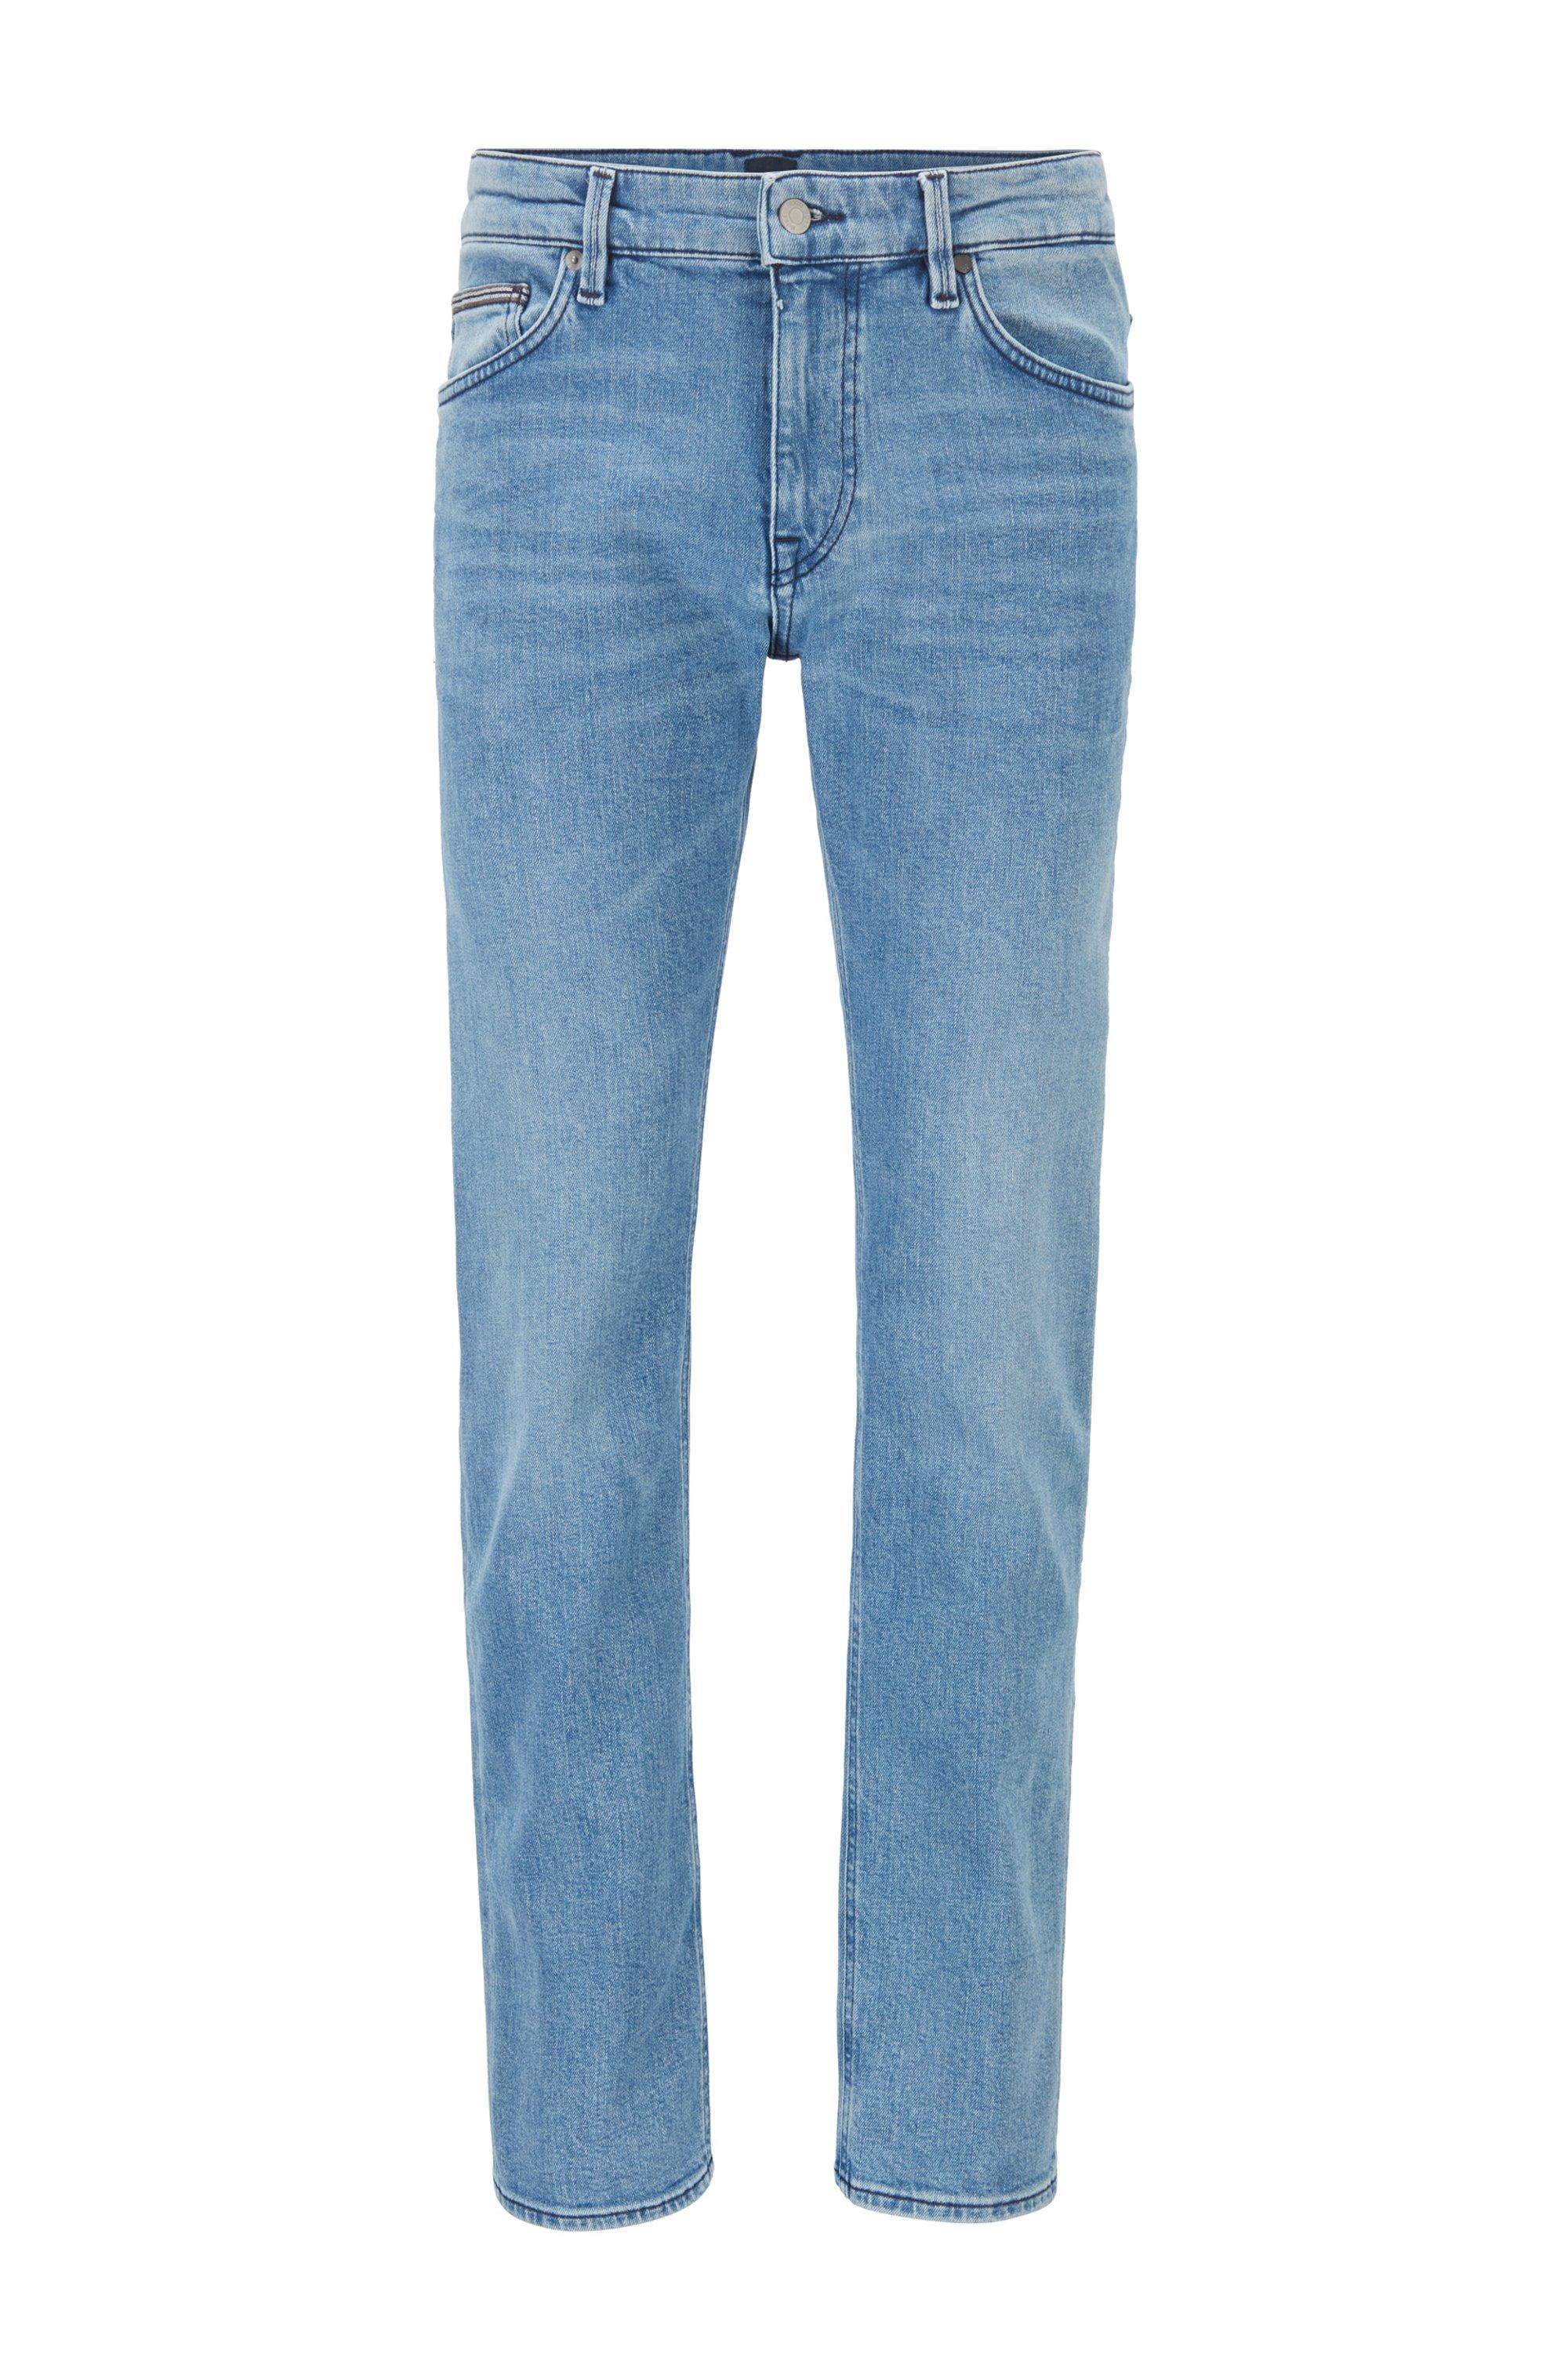 Regular-fit jeans in blue comfort-stretch denim, Turquoise